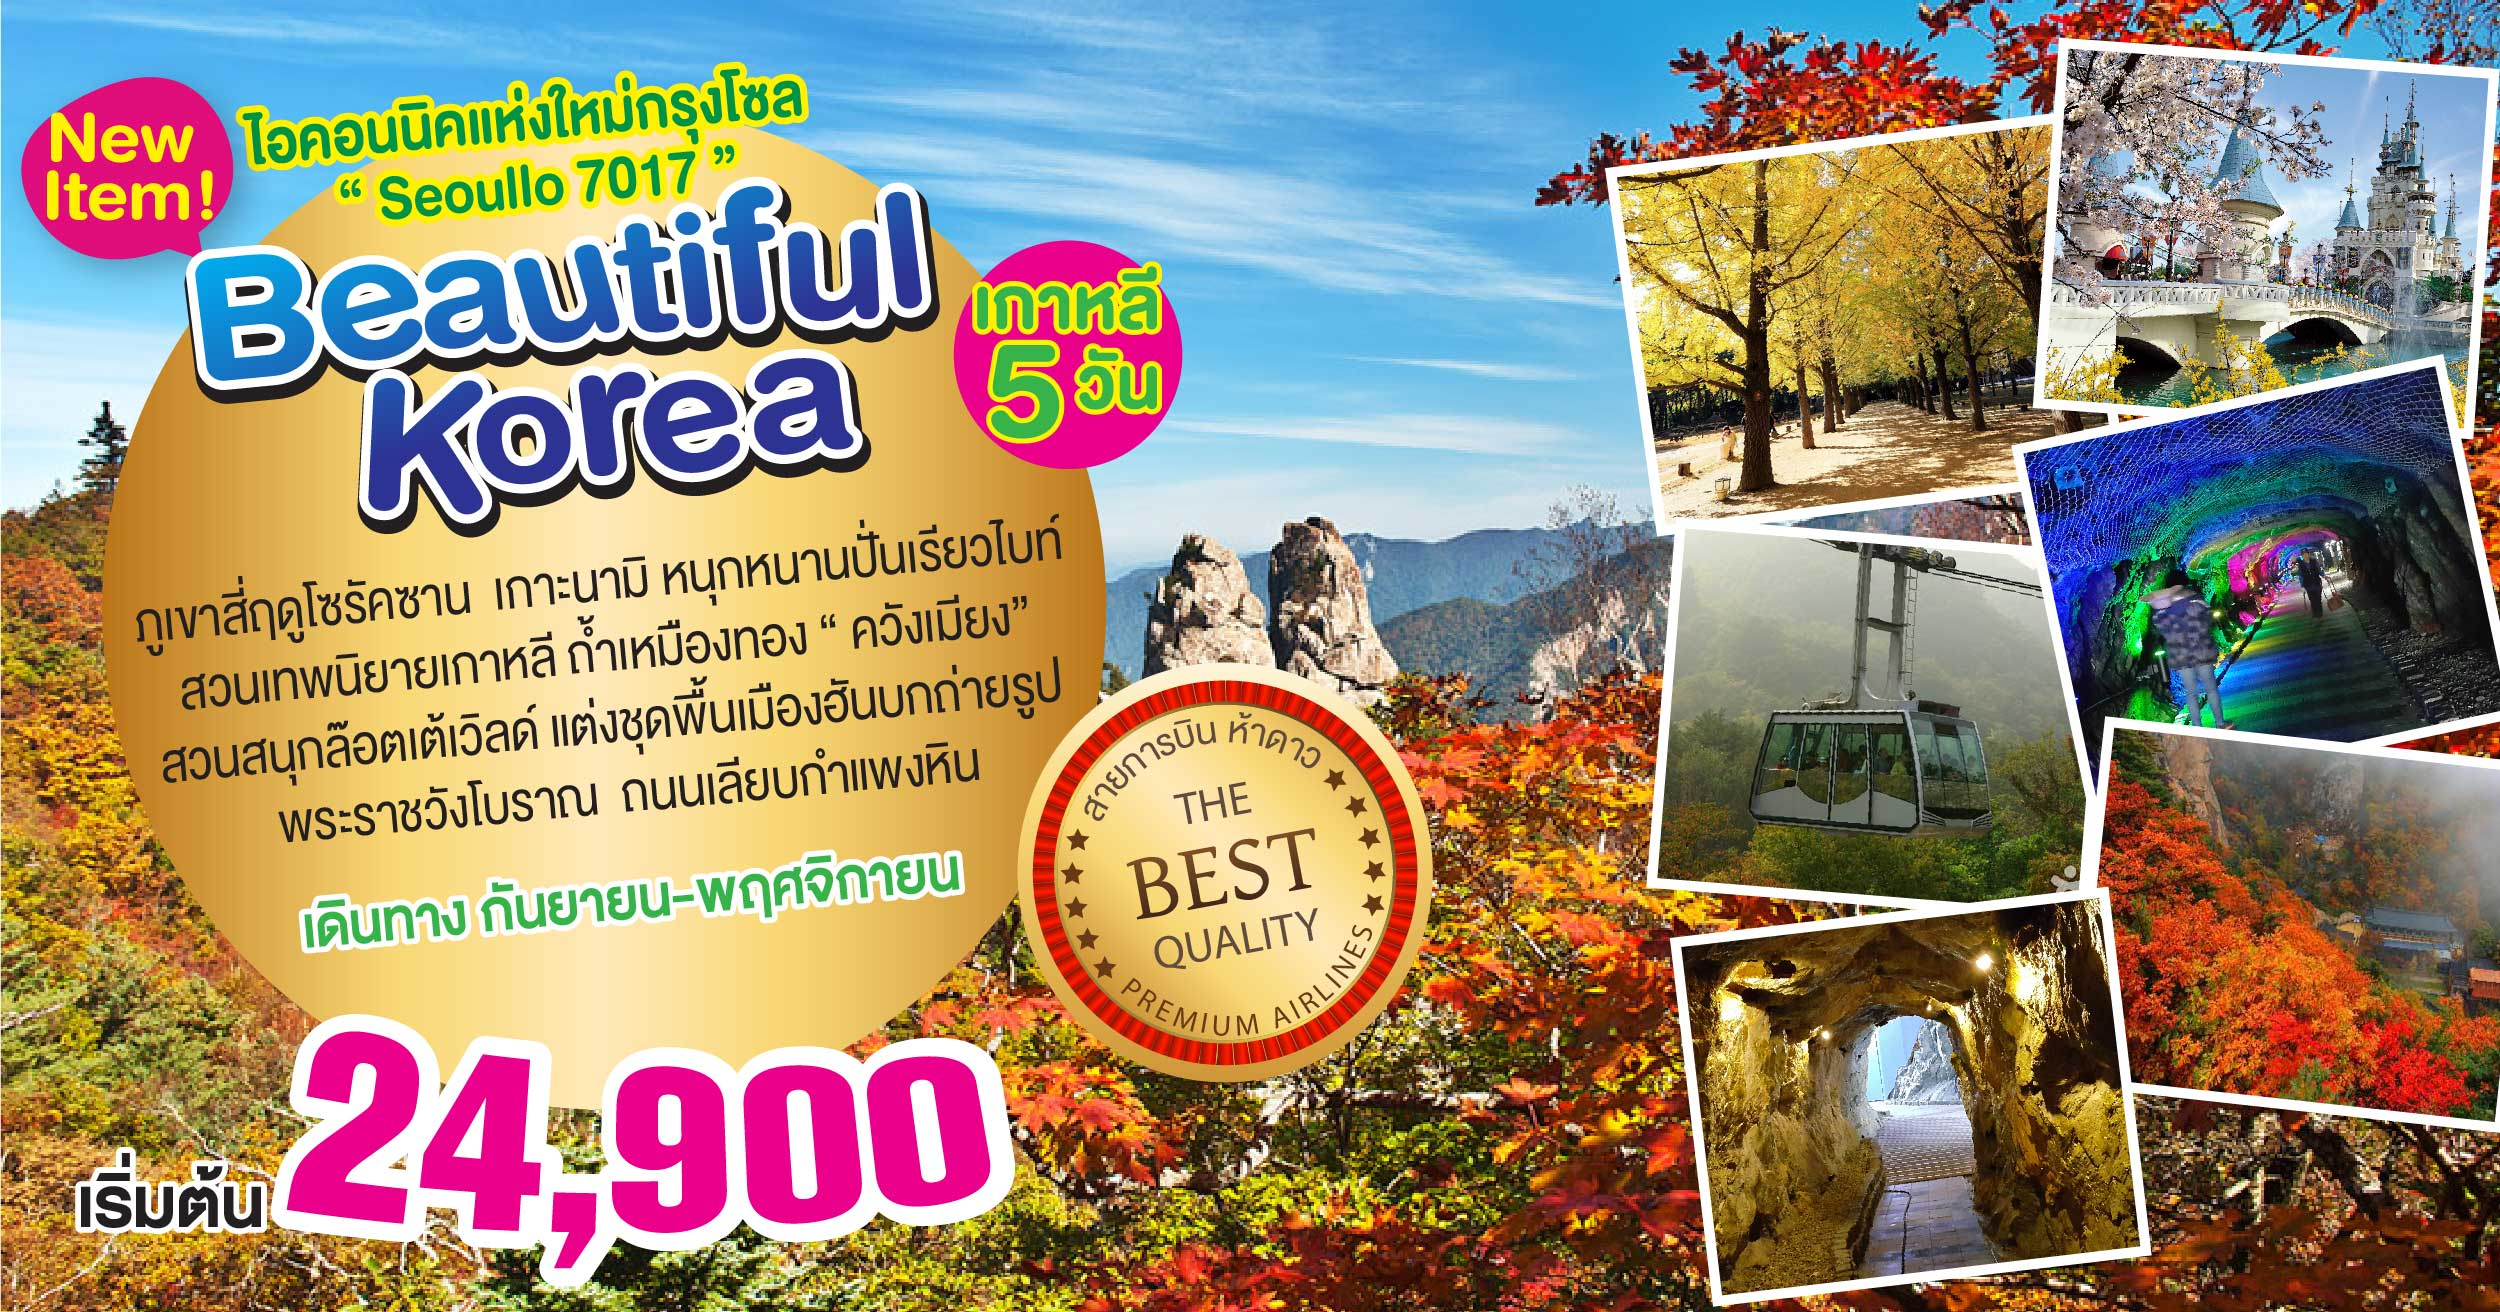 Beautiful Korea (บิน 5 ดาว)-01